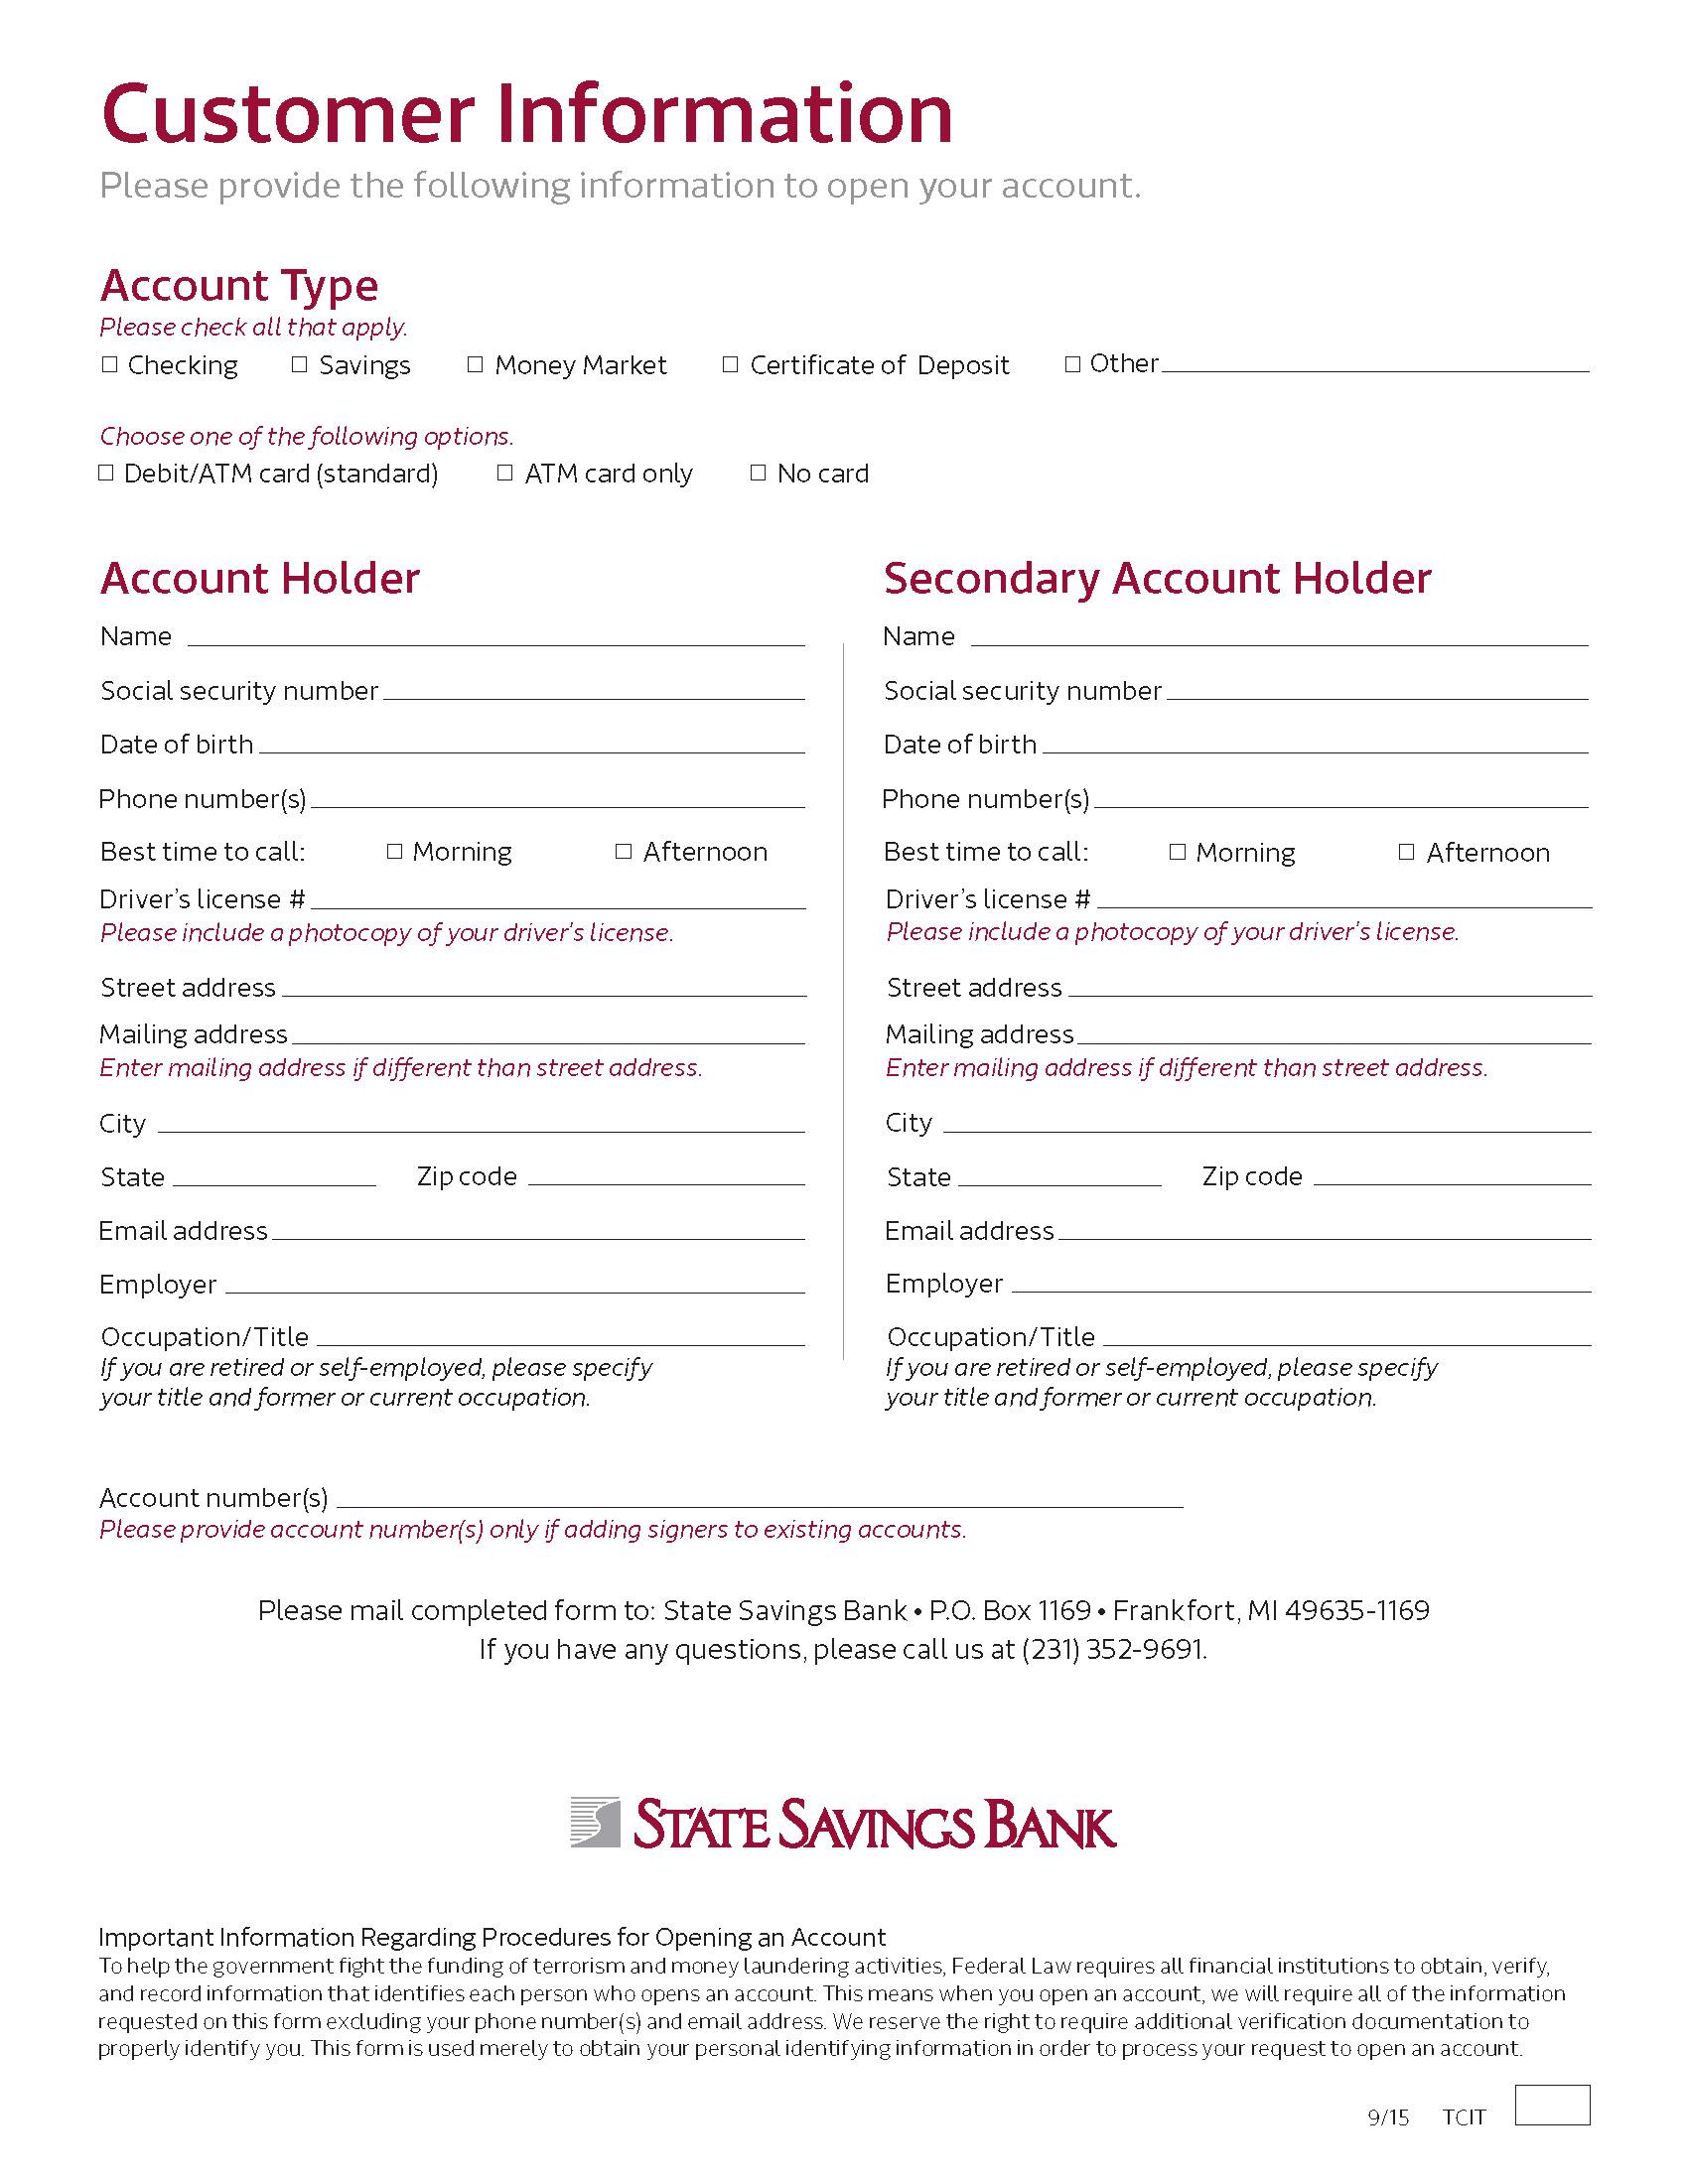 New Customer Set Up Form Tcit 9 24 15 Copy Jpg